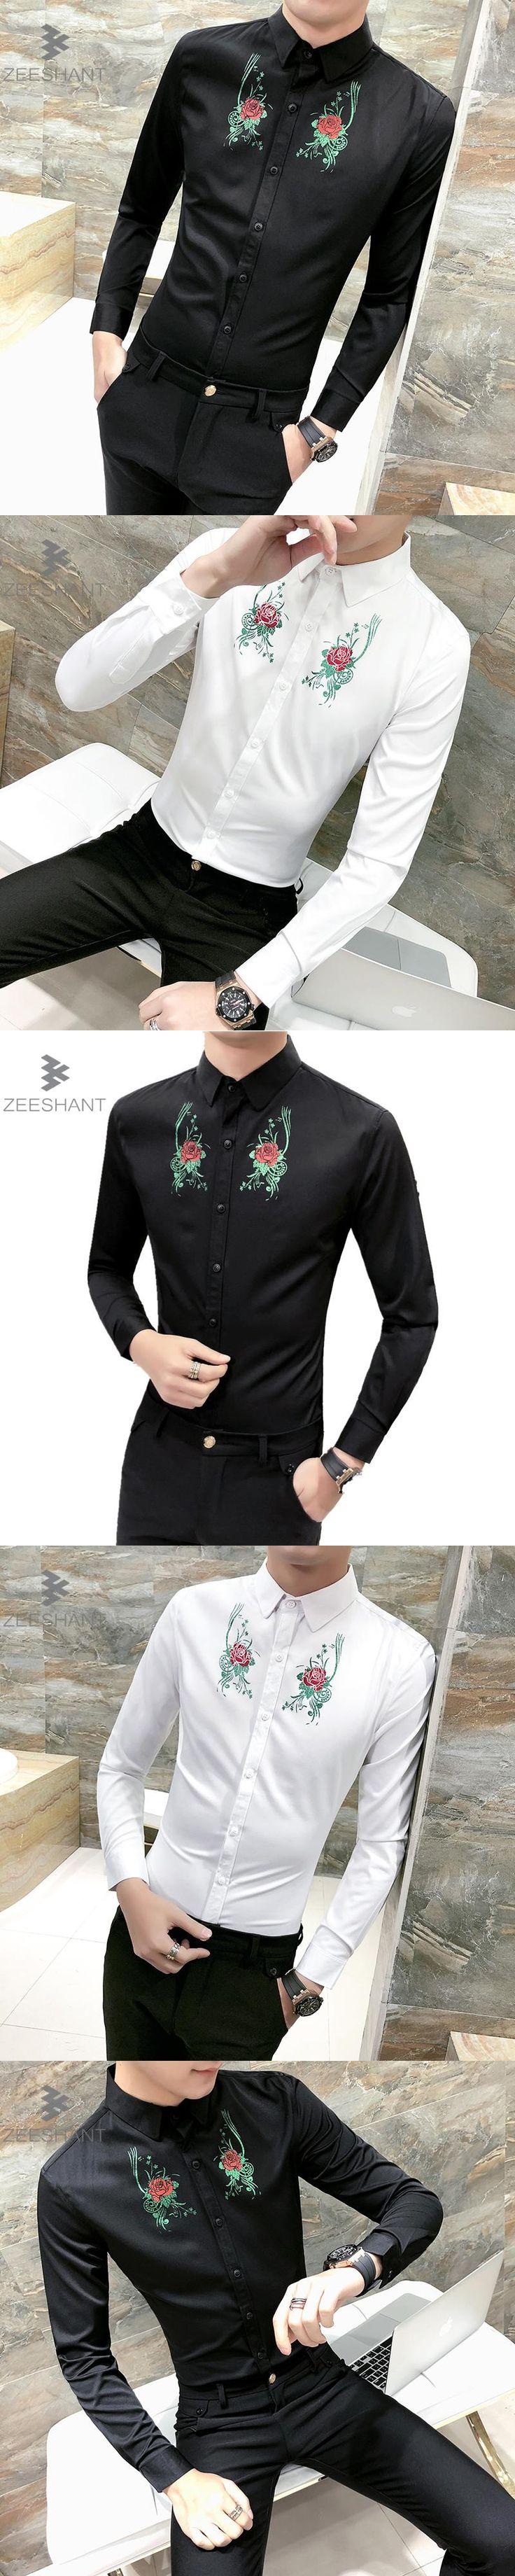 Zeeshant 2018 Spring Flower Printed Men Dress Shirt  Male New Long Sleeve Slim Fit Shirt in Men's Tuxedo Shirts XXXL